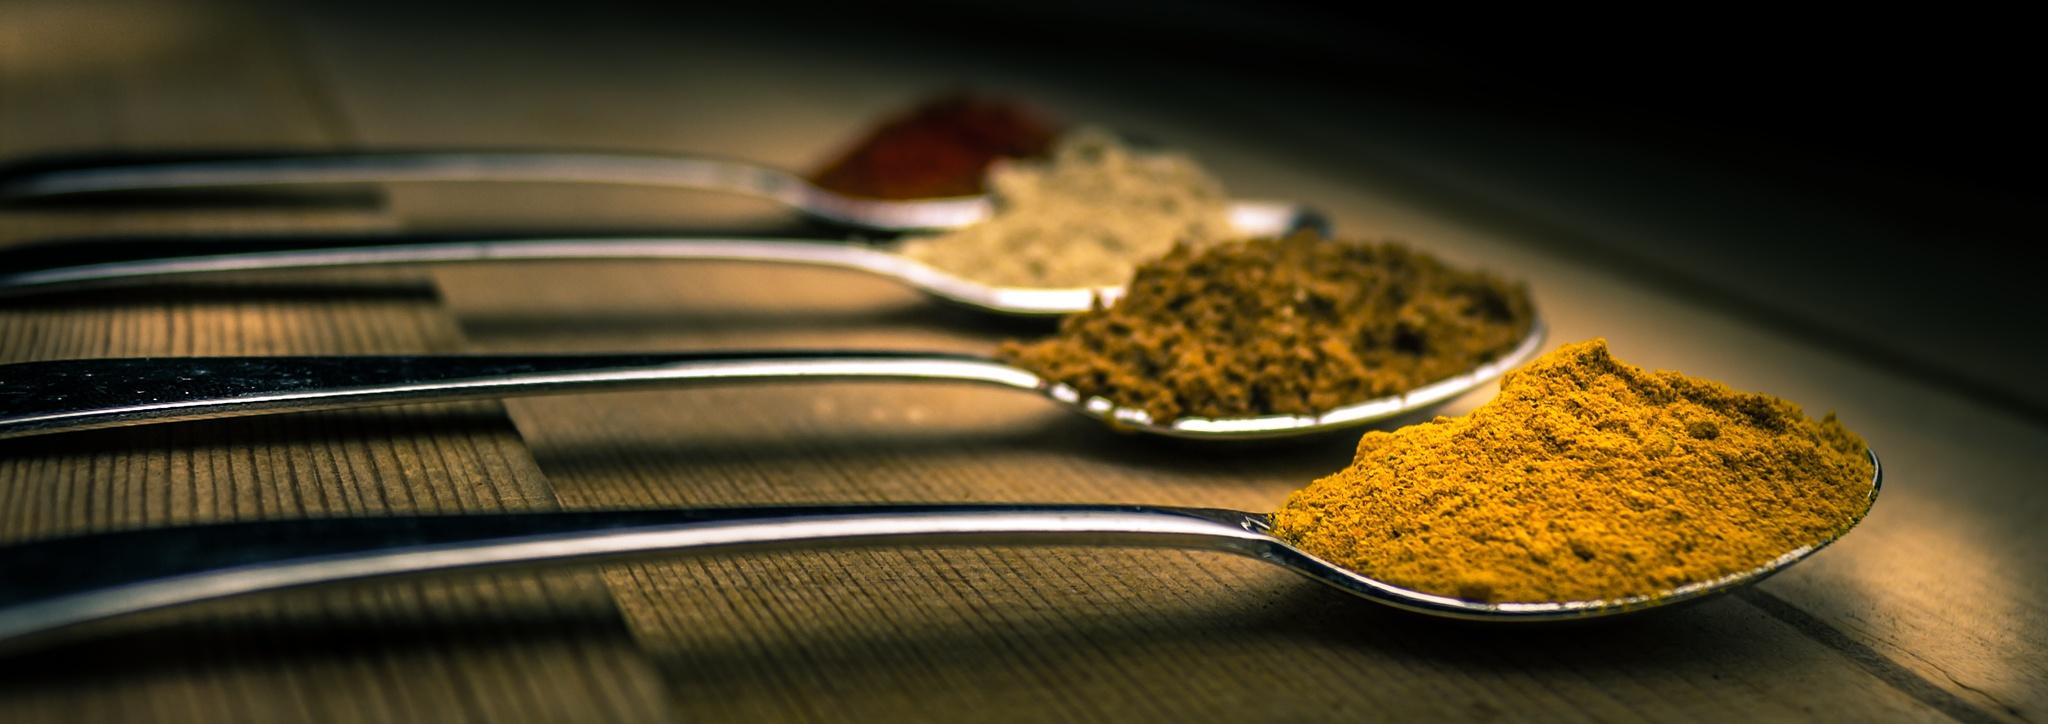 Spices 4 by Ashraf Sabbah